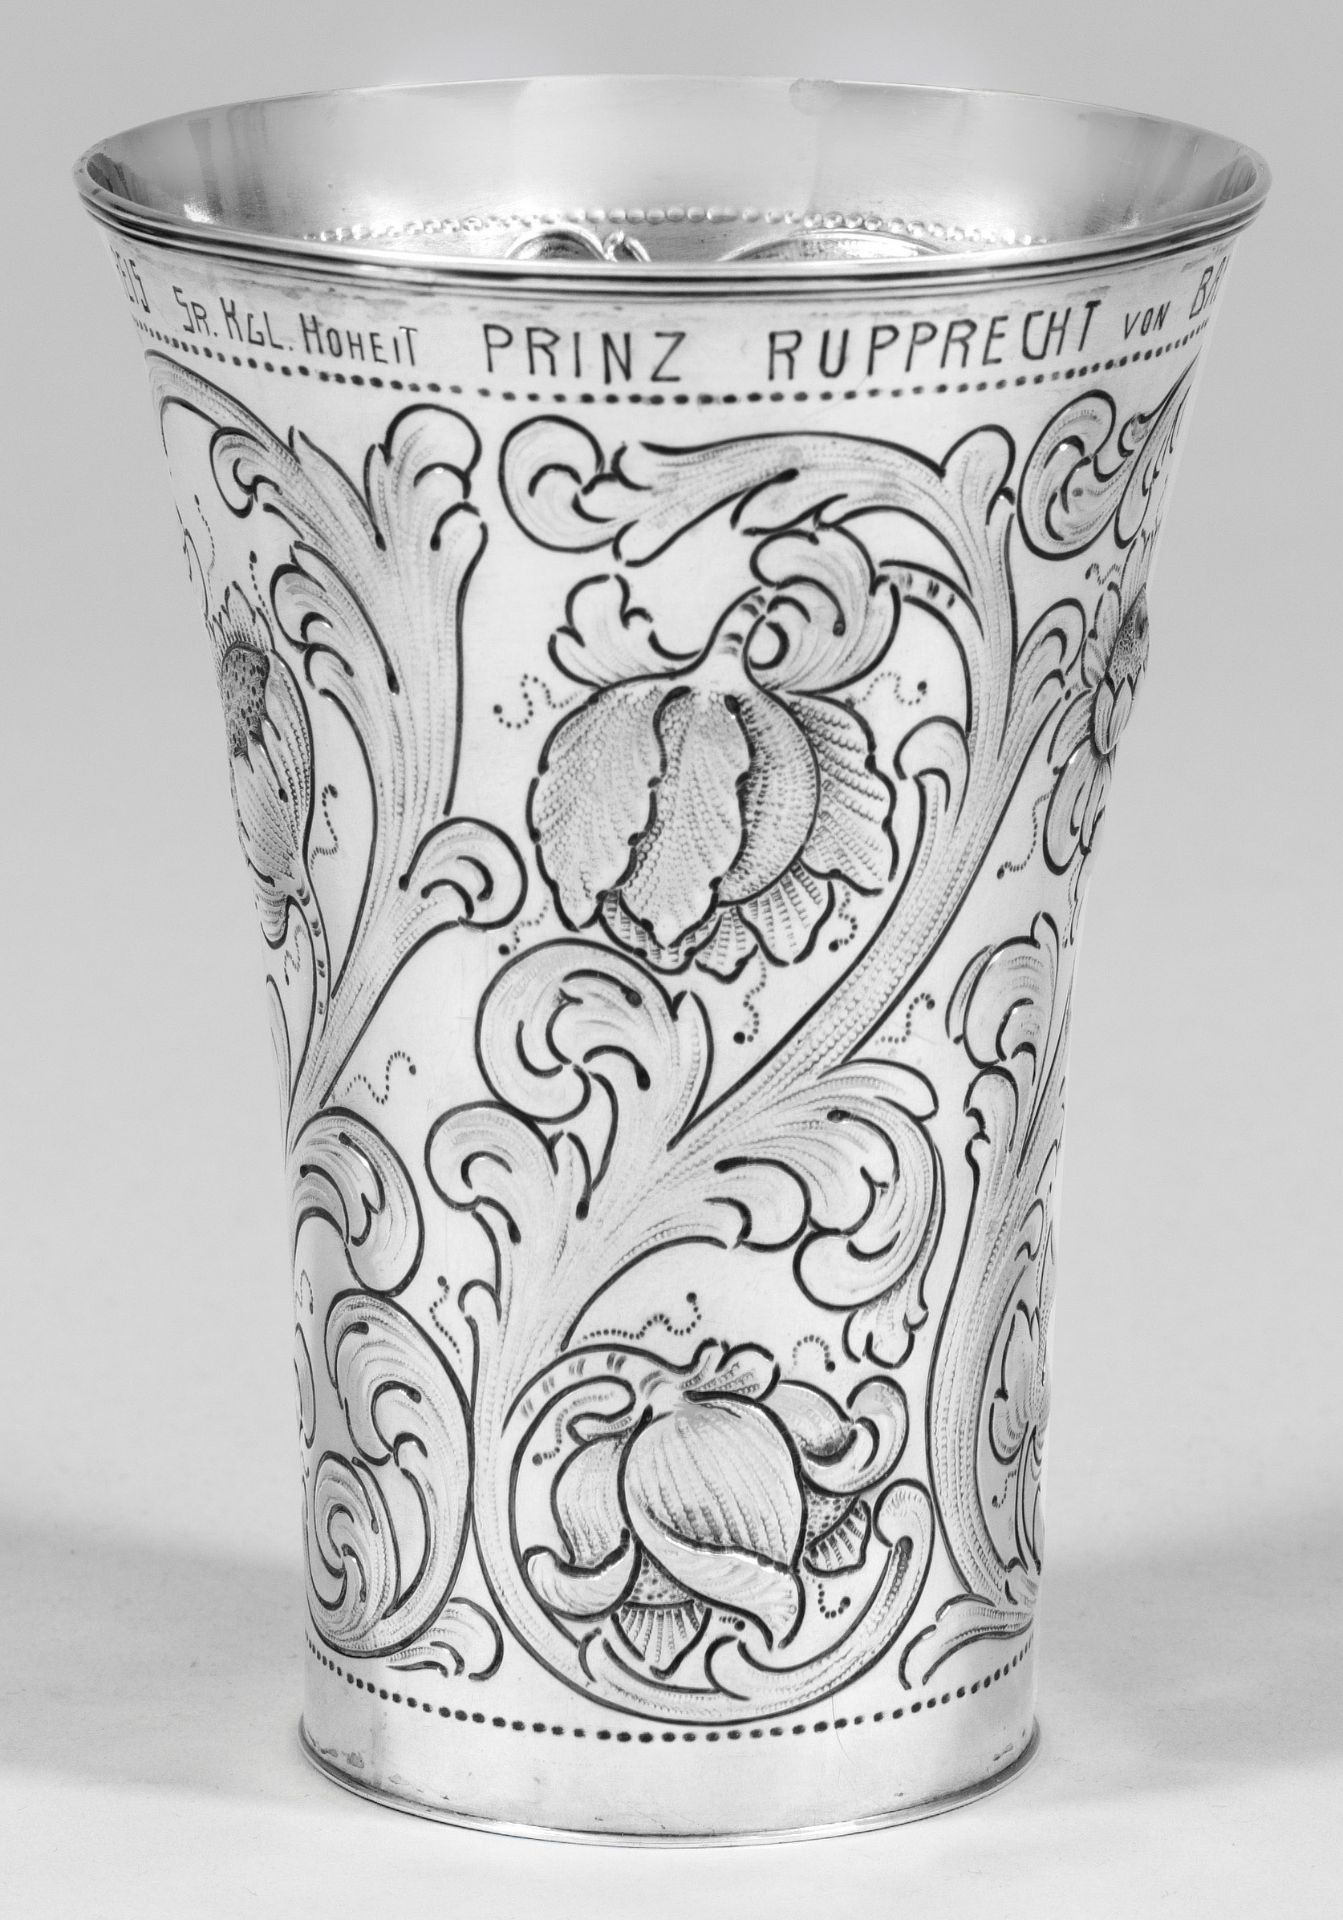 Seltene Bechertrophäe - Image 3 of 3